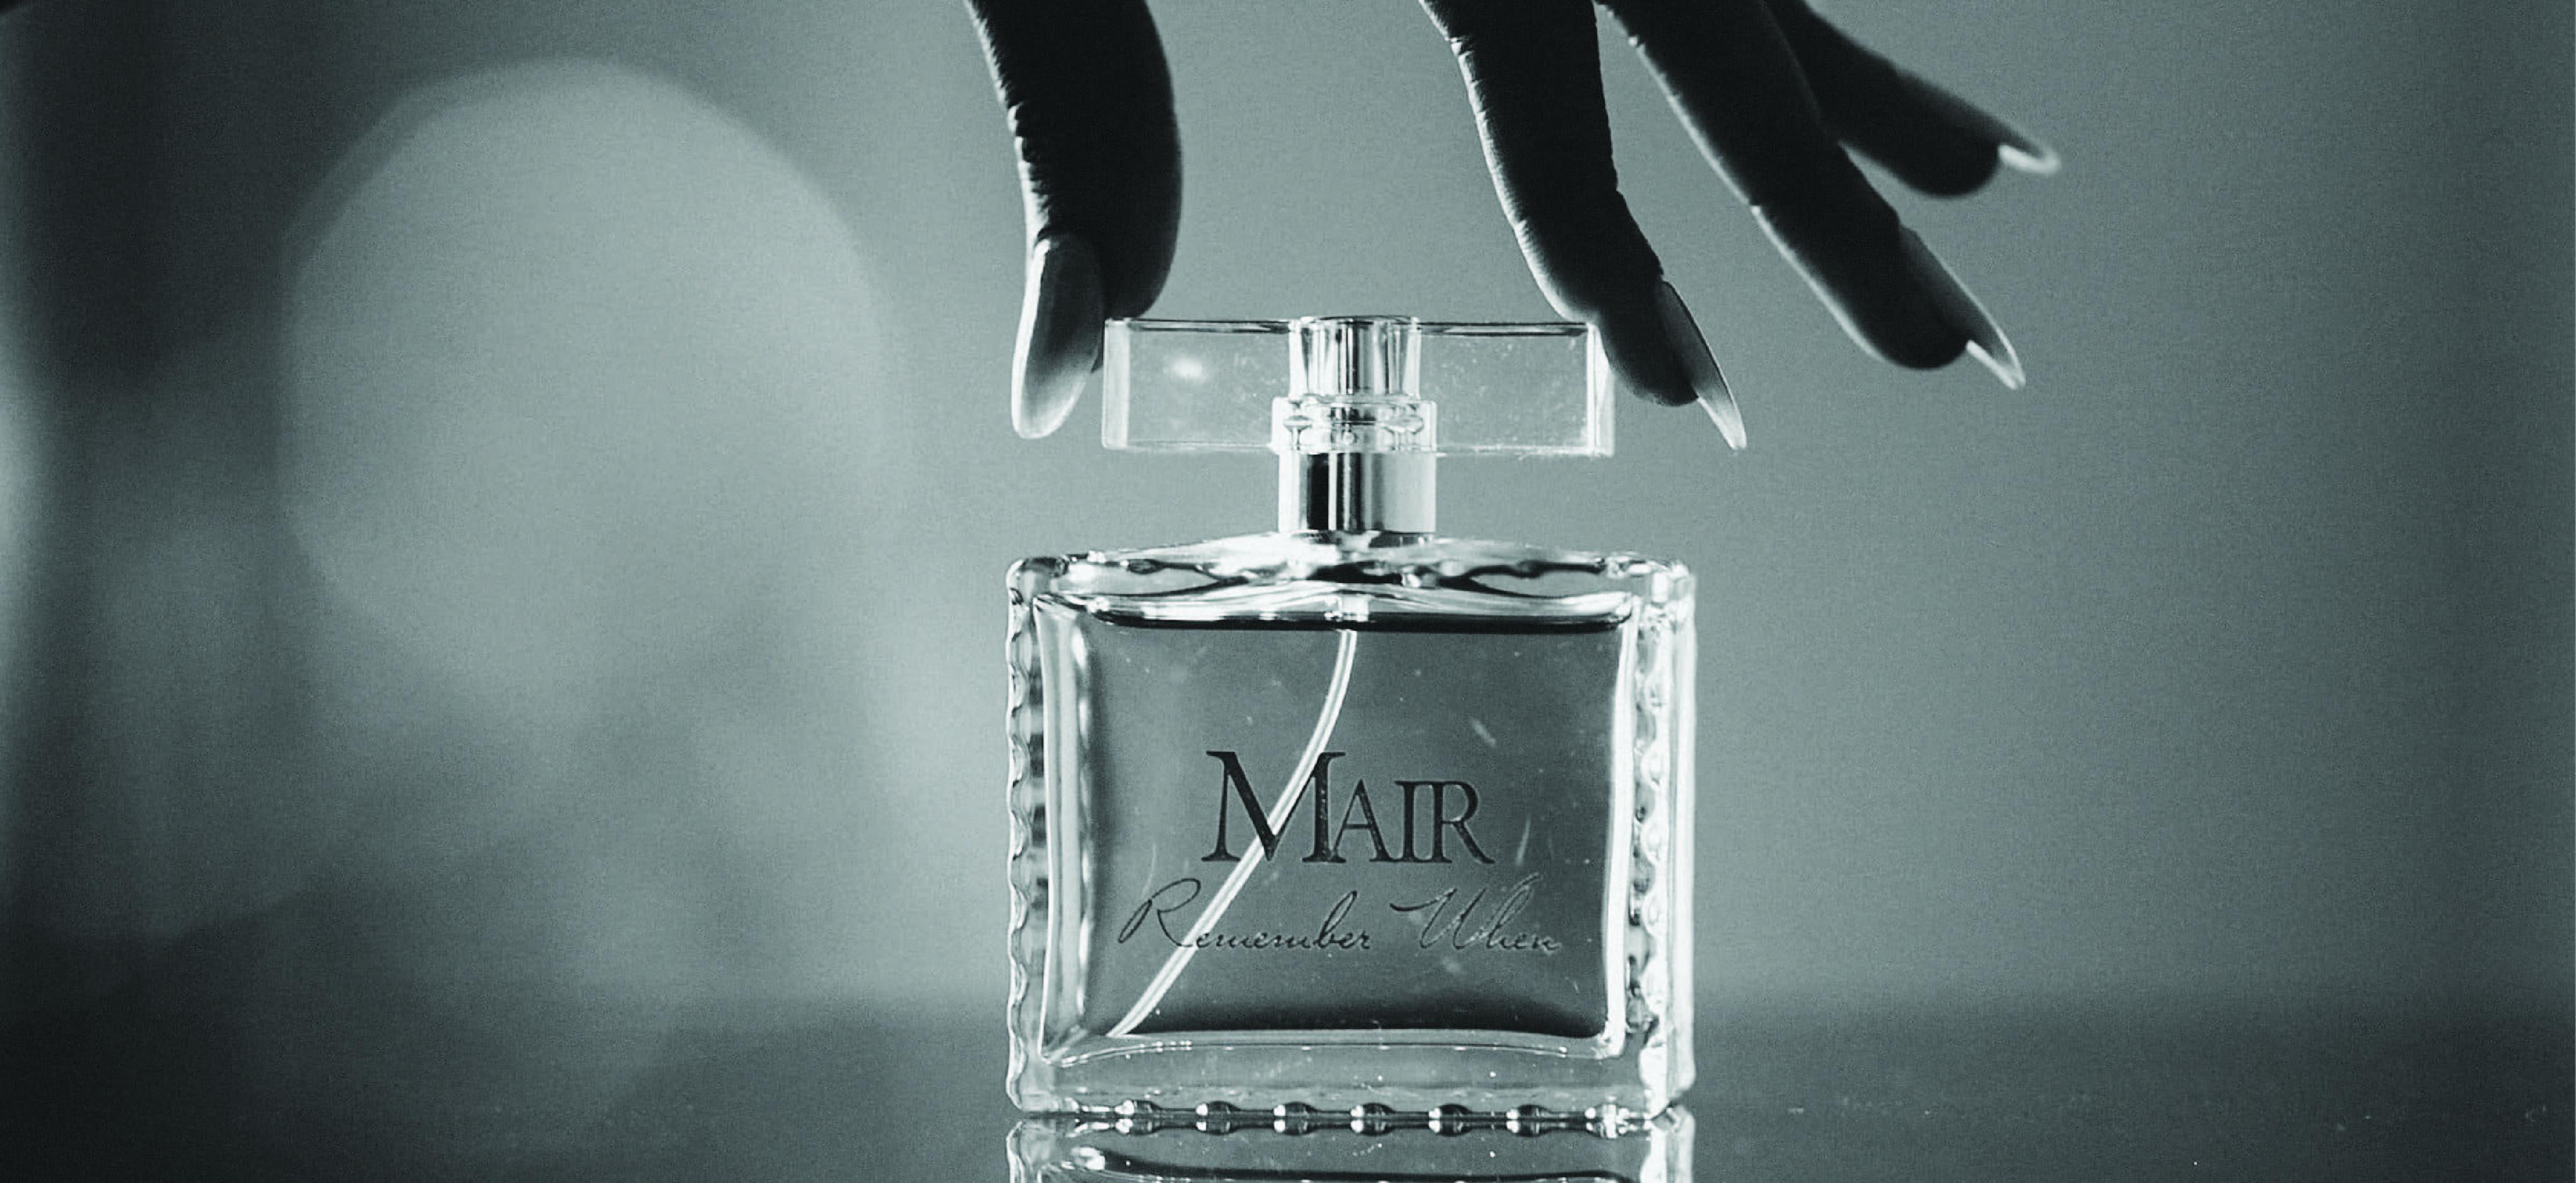 Mair Citrus Fragrance